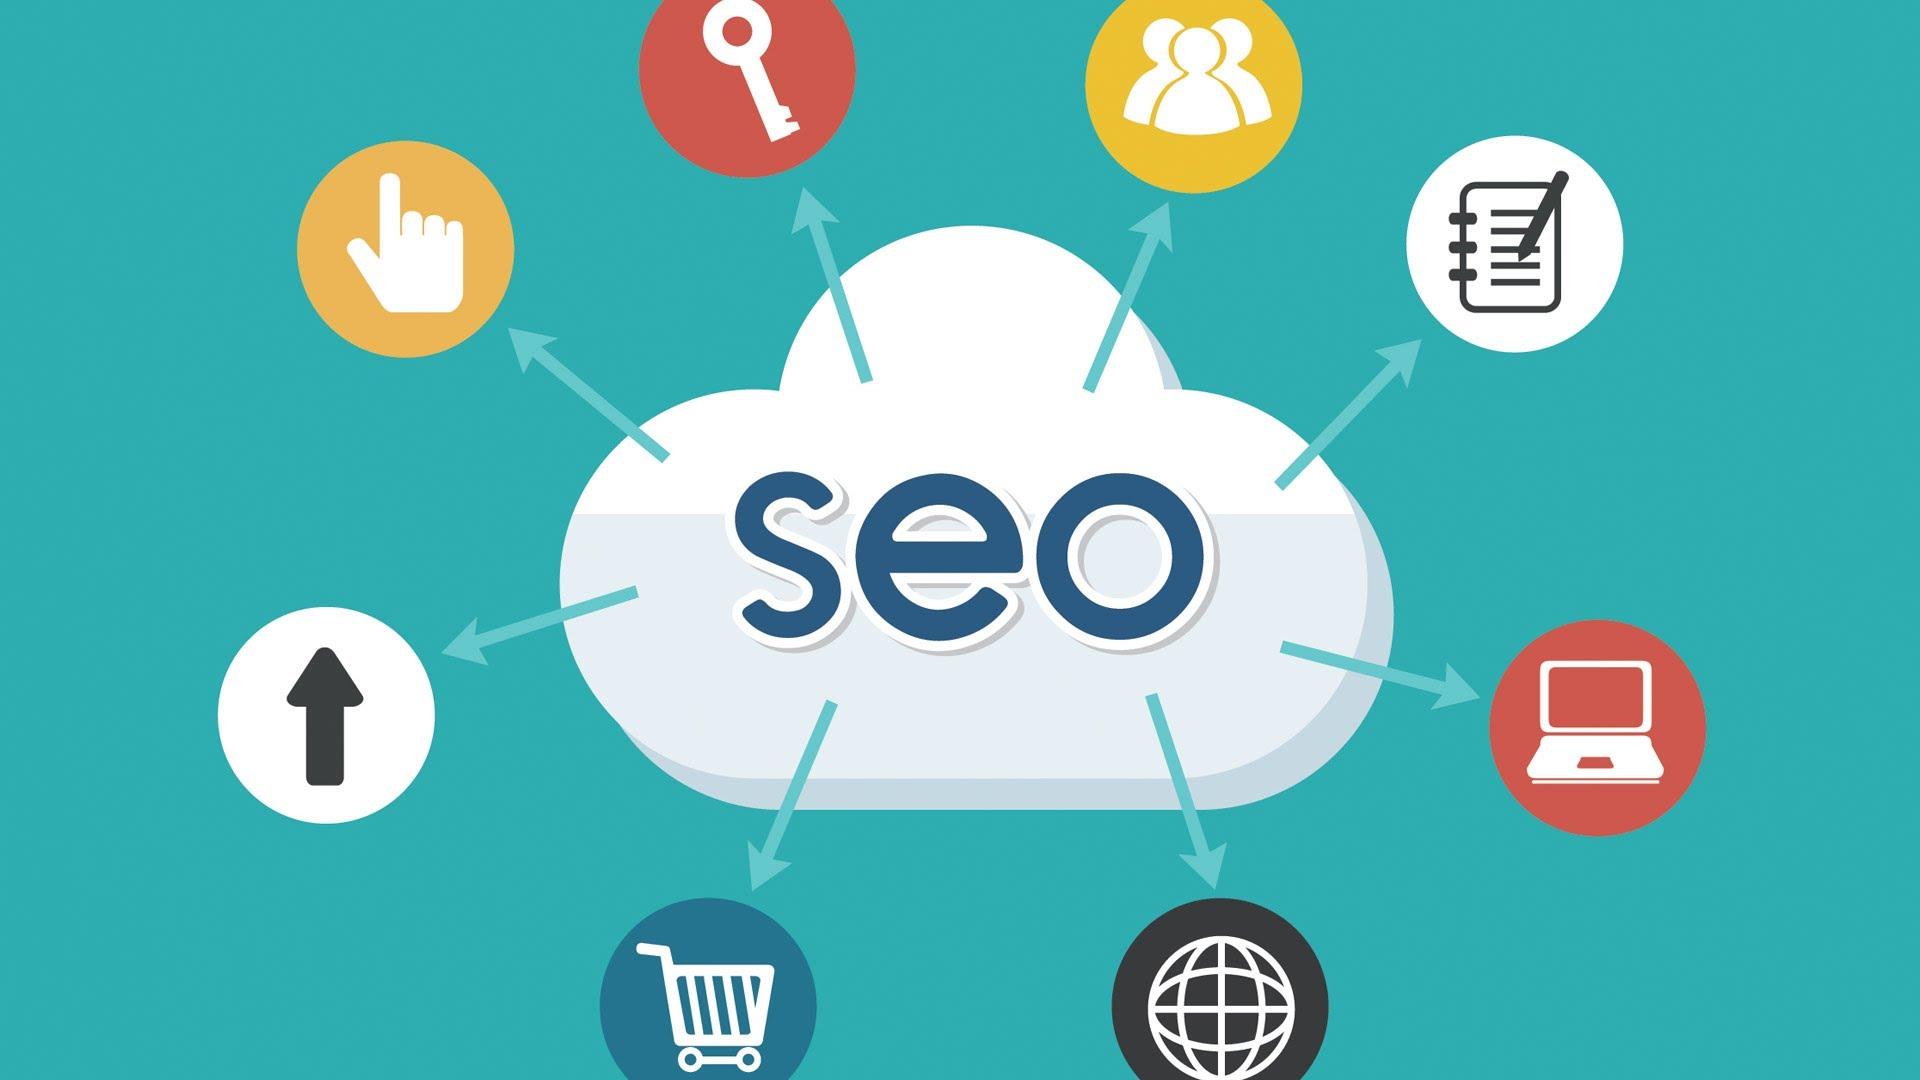 Seo Benefits Header Image